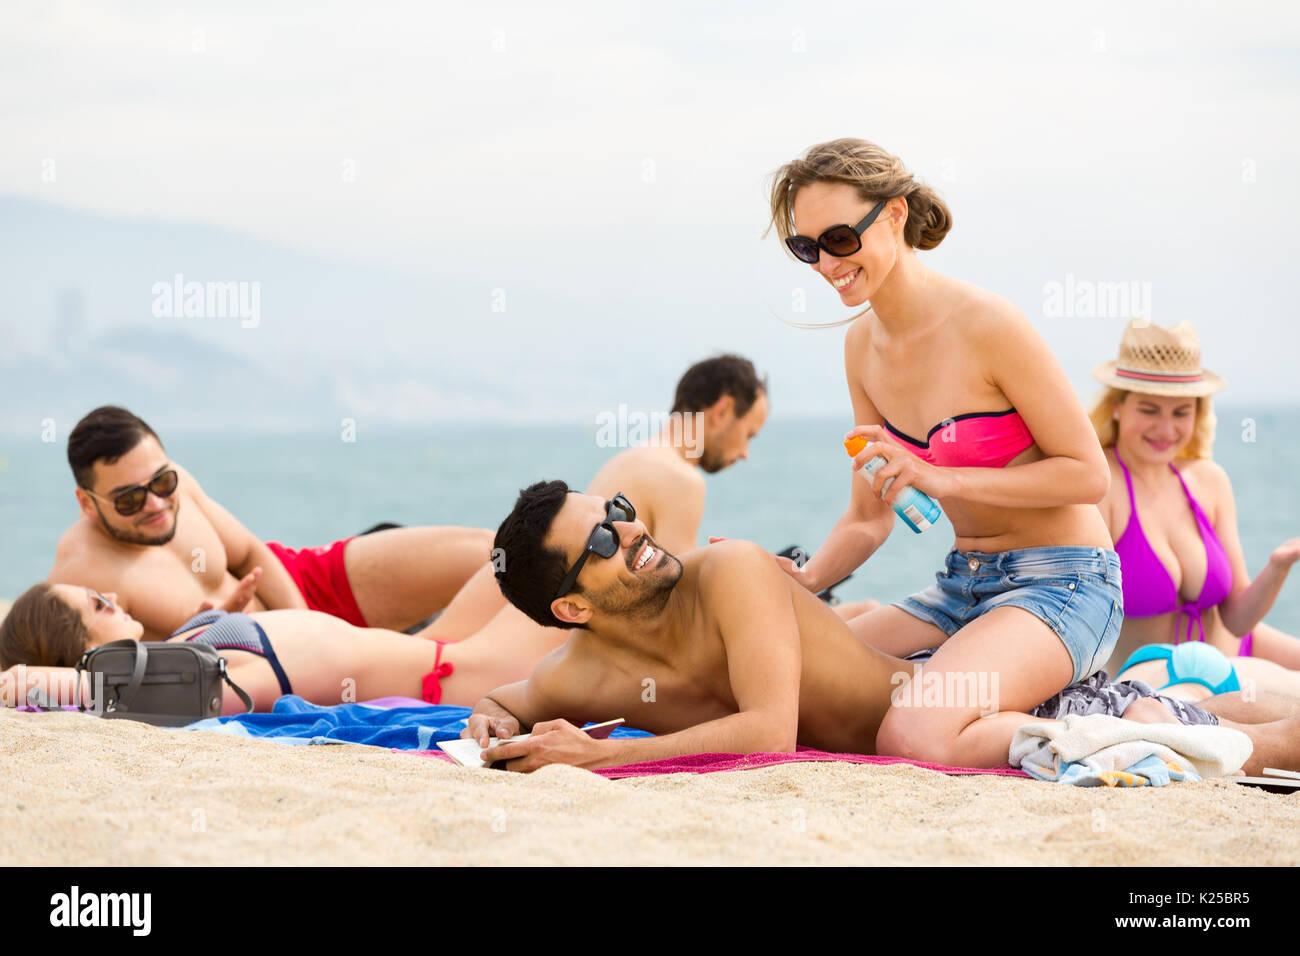 Beach attendant rubs suntan oil on angelys 5